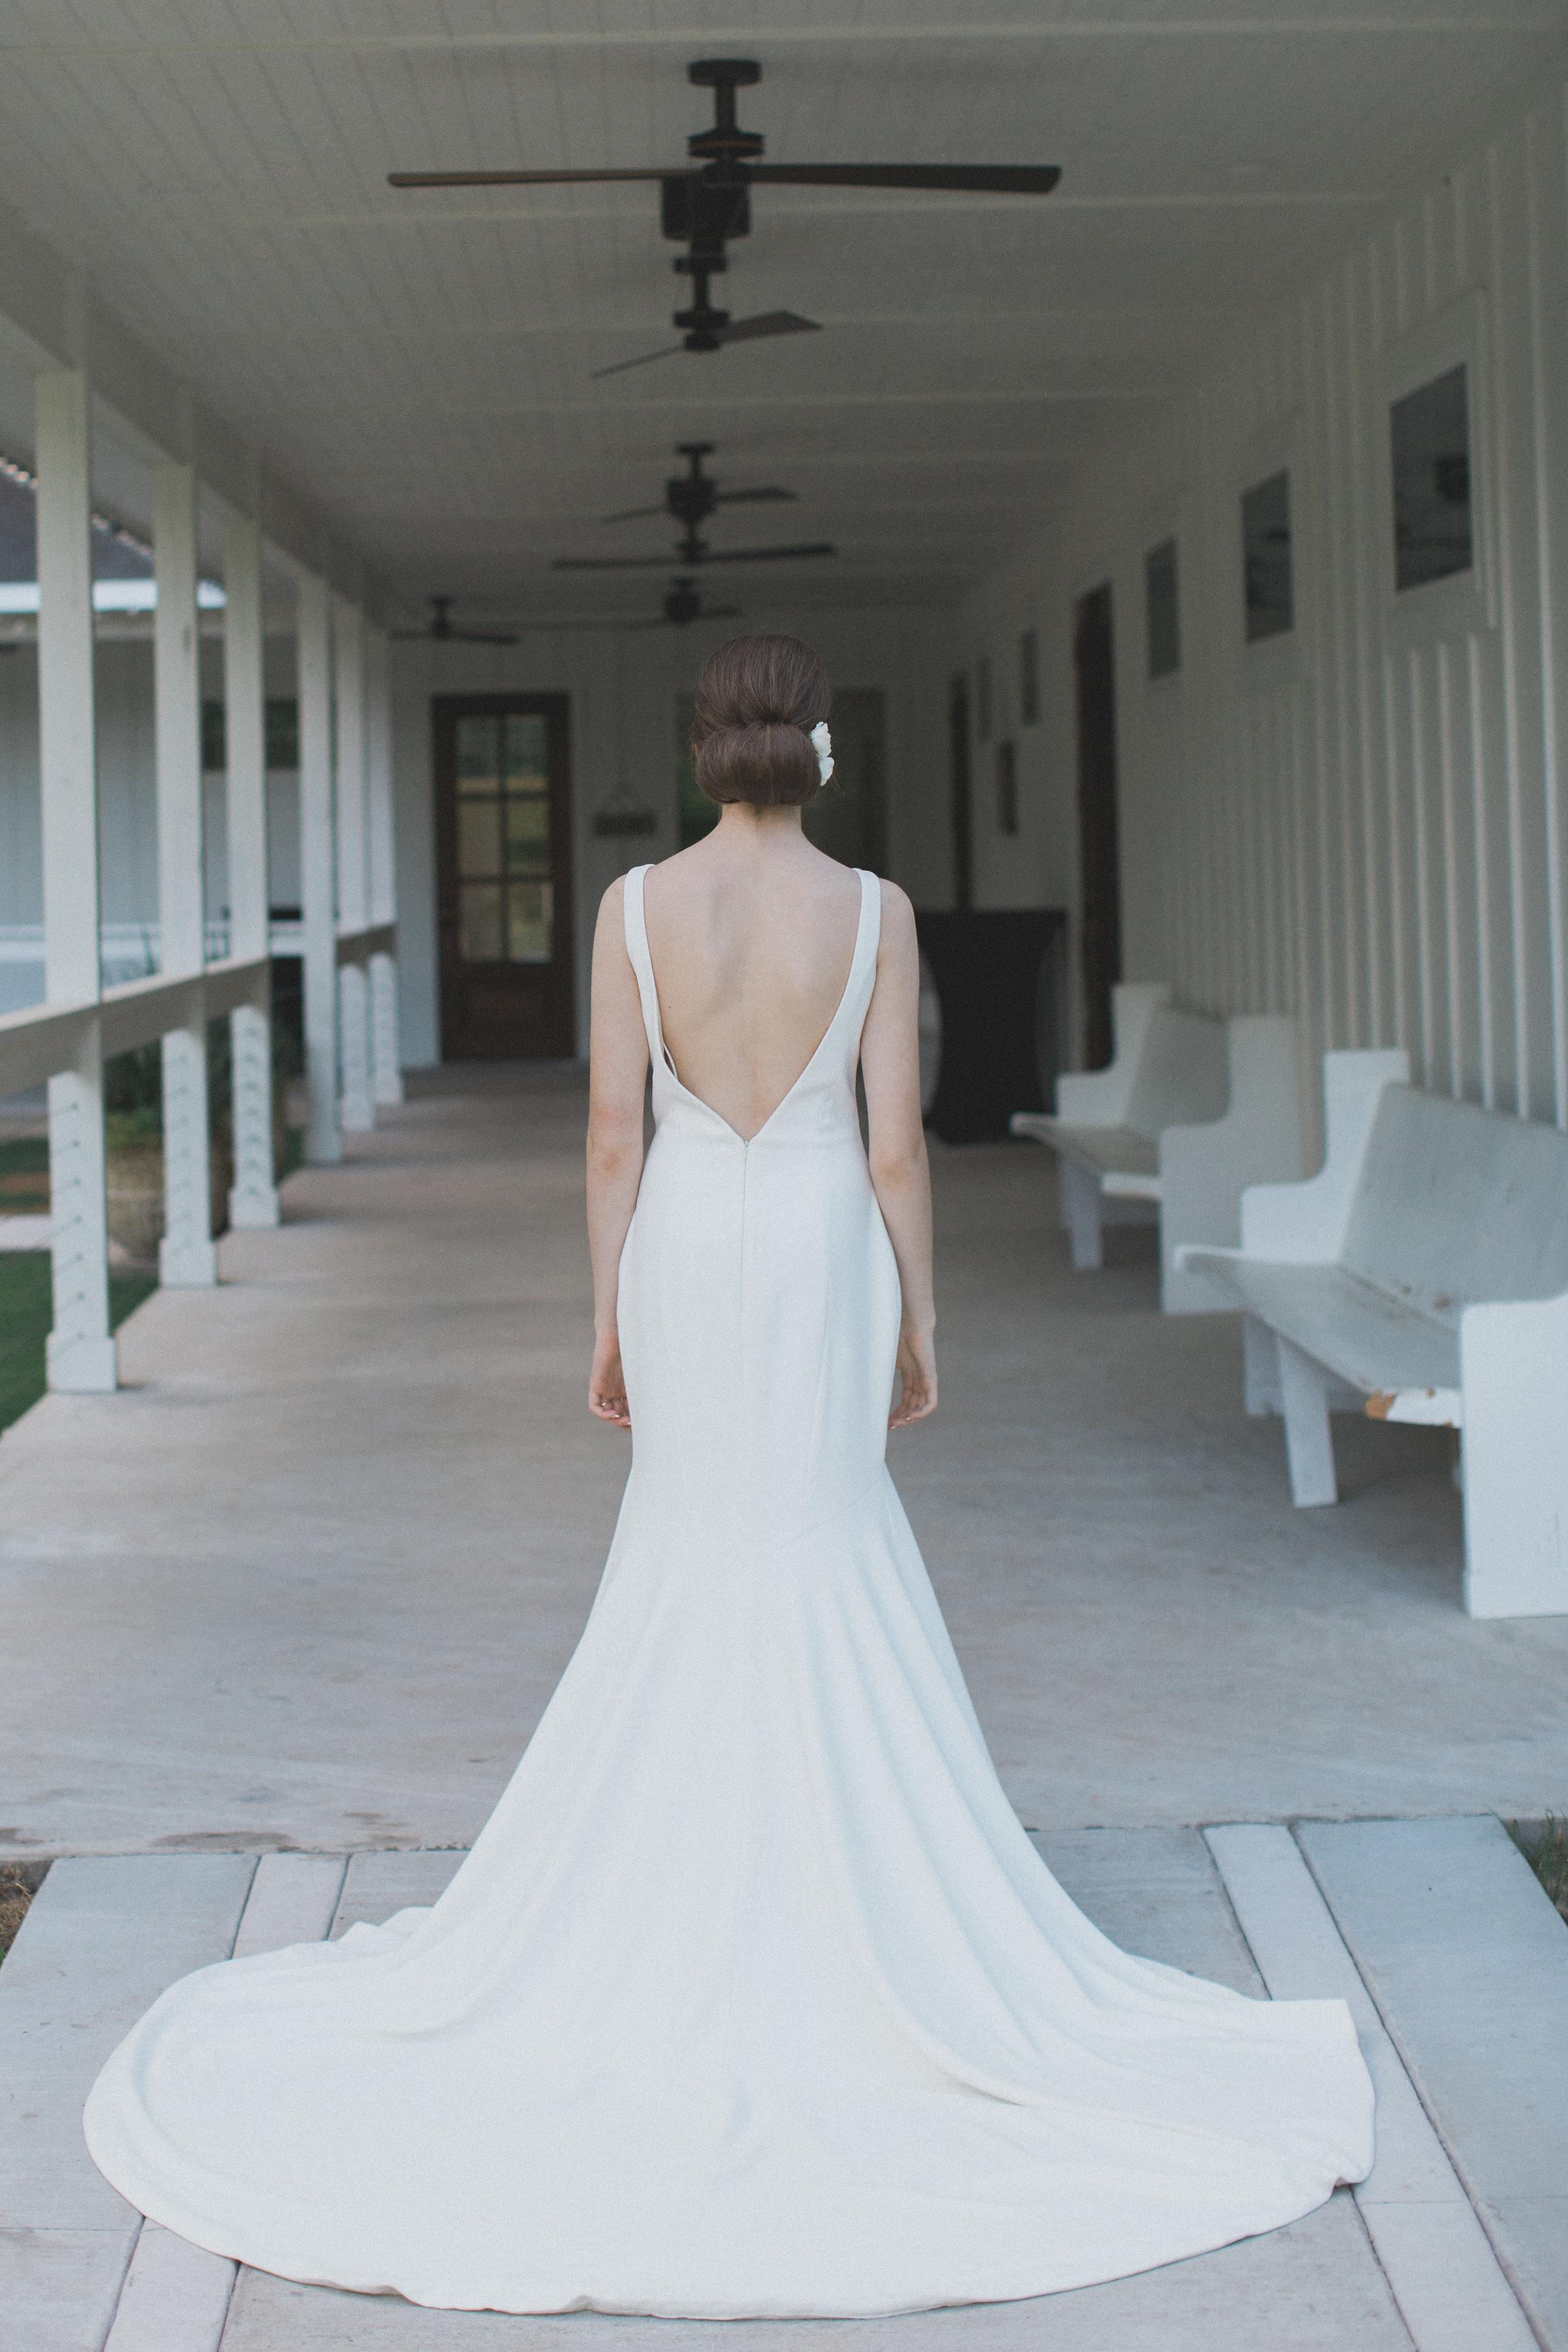 Simple Elegant Wedding Gown Inspiration | Southern Summer White Barn Wedding in Dallas, TX